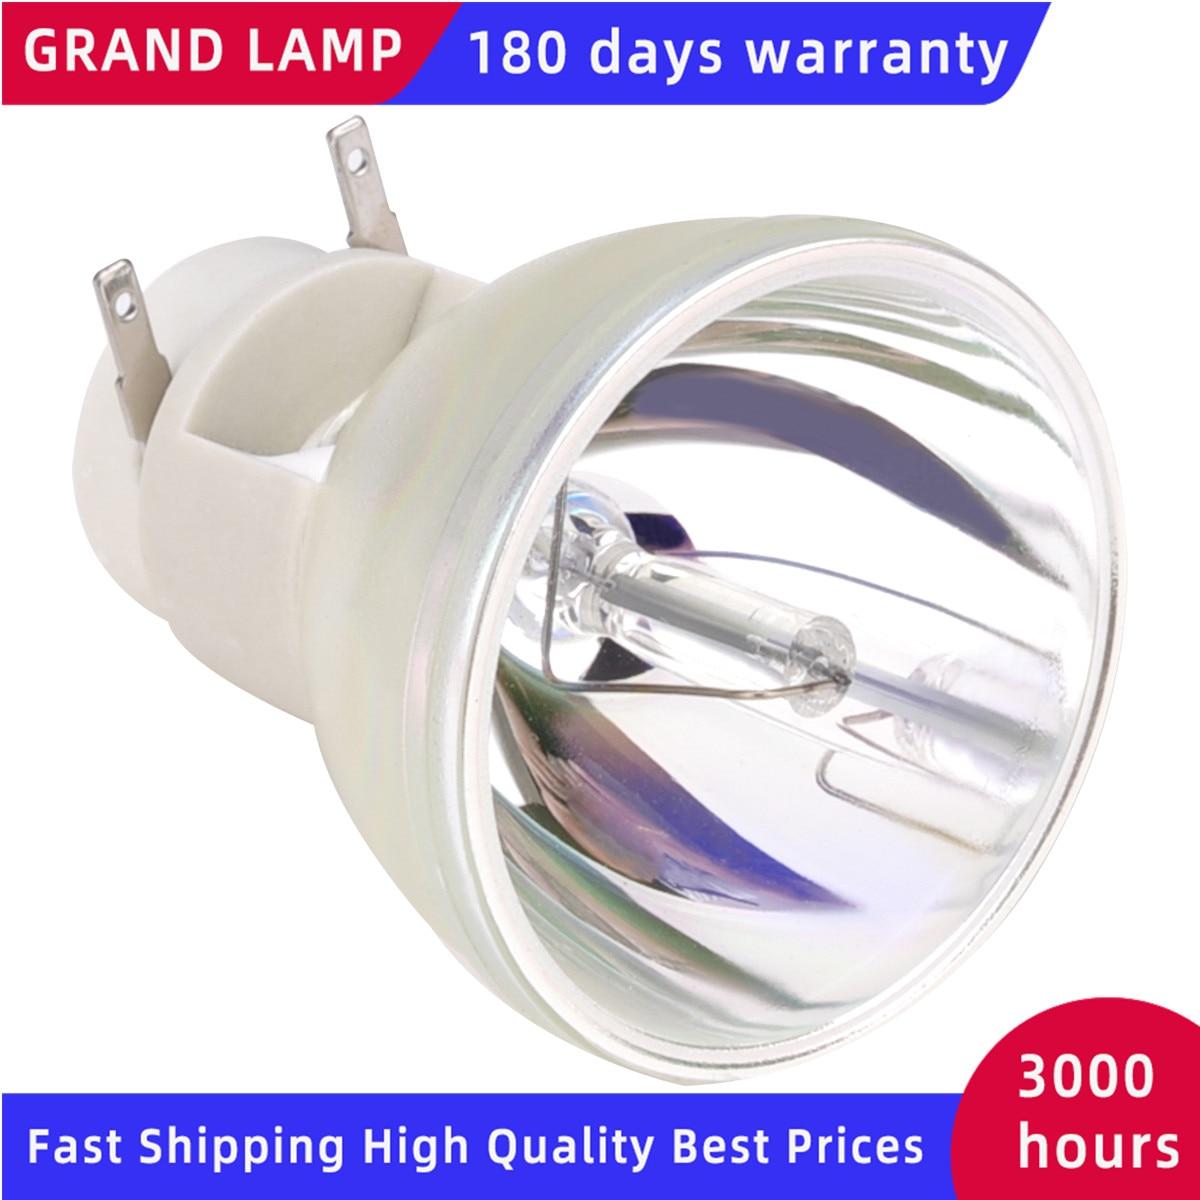 RLC-071 fábrica lámpara de proyector Compatible/bombilla para VIEWSONIC PJD6253 PJD6383 PJD6383s PJD6553w PJD6683w PJD6683w feliz BATE